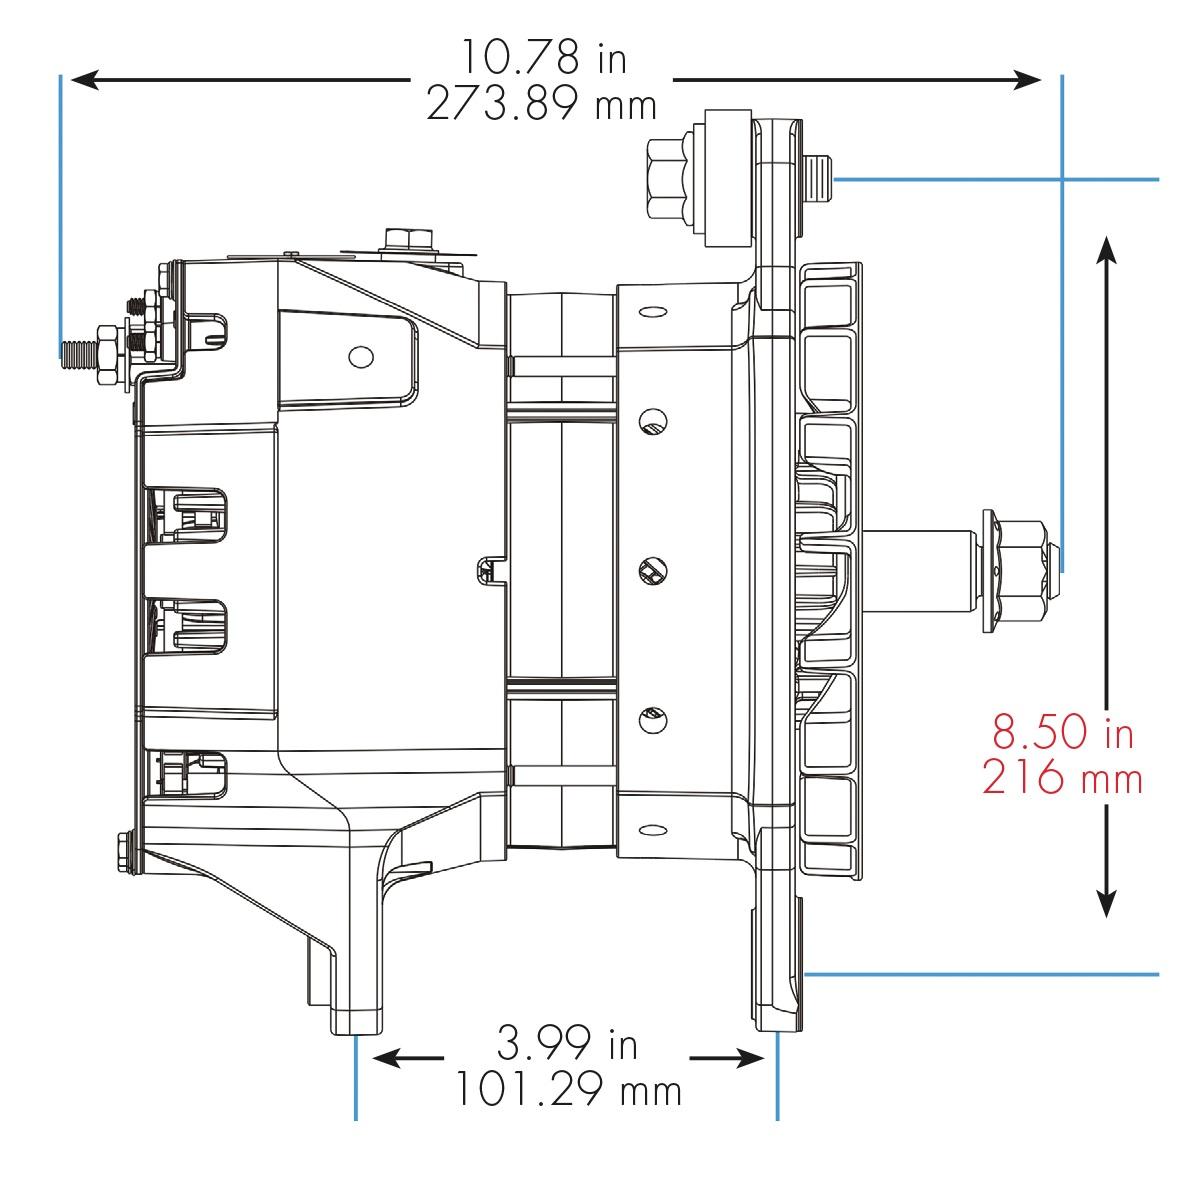 22si alternator wiring diagram identify diagram alternator wiringdelco remy si alternator wiring diagram wiring diagram alternators [ 1191 x 1193 Pixel ]